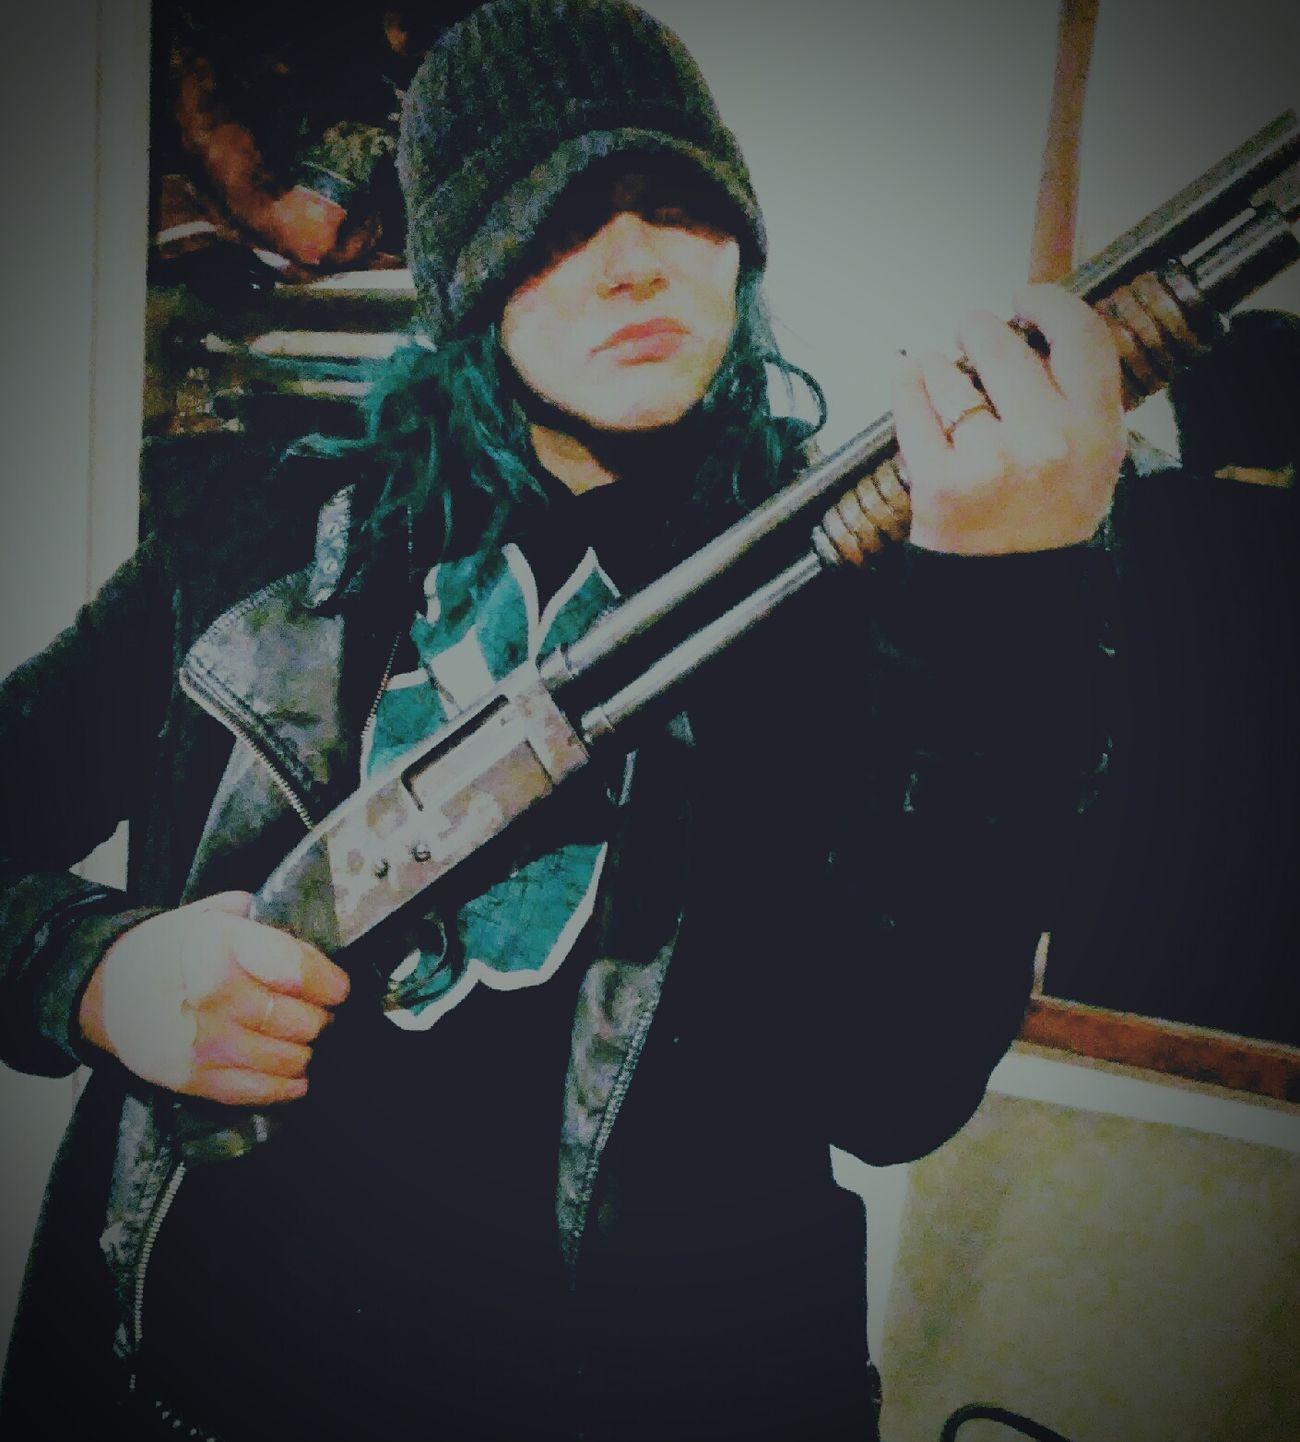 Armed Forces Shotgun!!! Zombieapocalypse Jungle Shoot Seattle Jungle Big Gun Sawed Off Firealarm Anarchy girls & guns